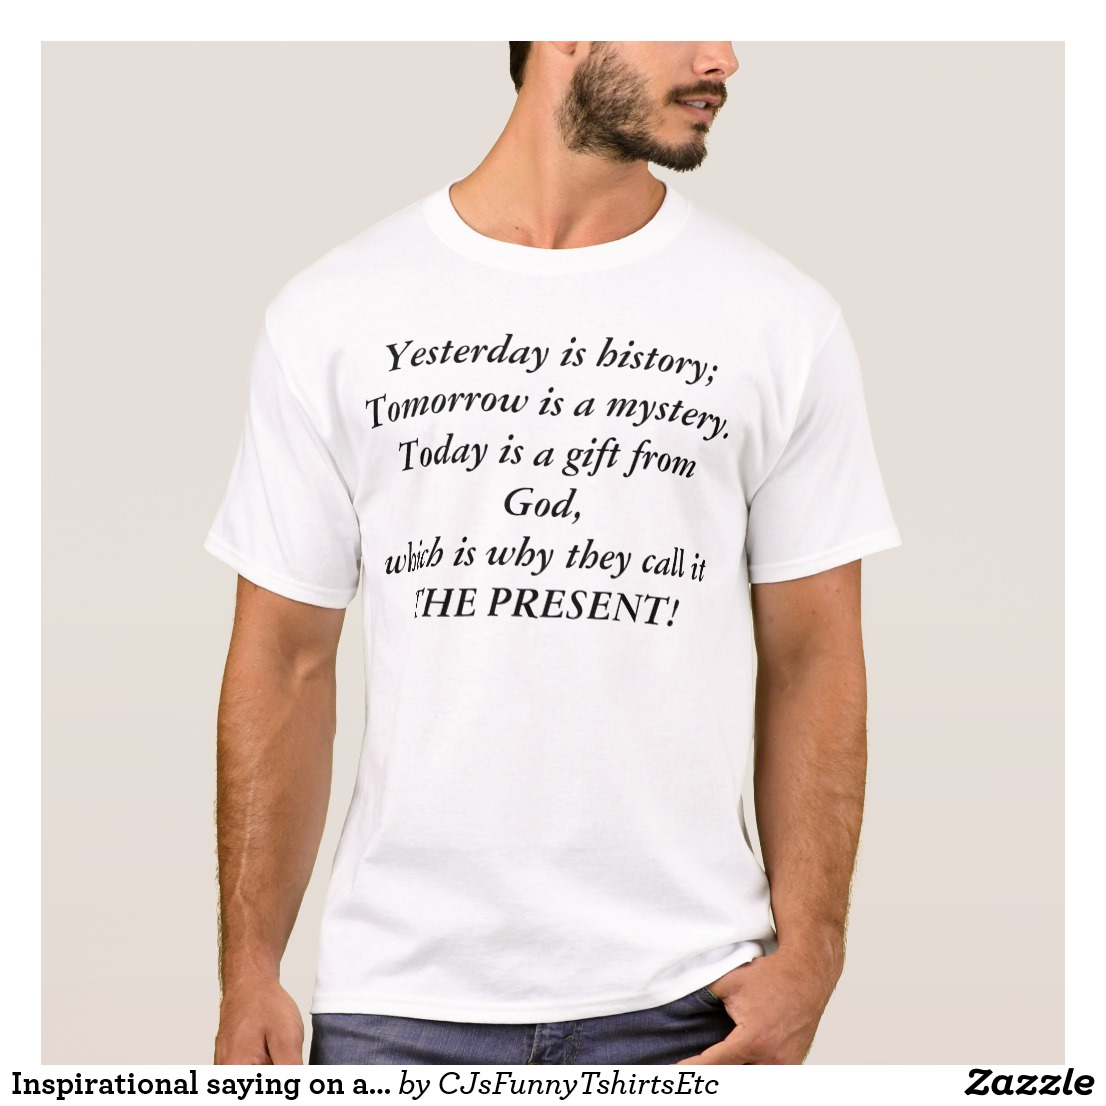 Inspirational Saying on a T-Shirt Image